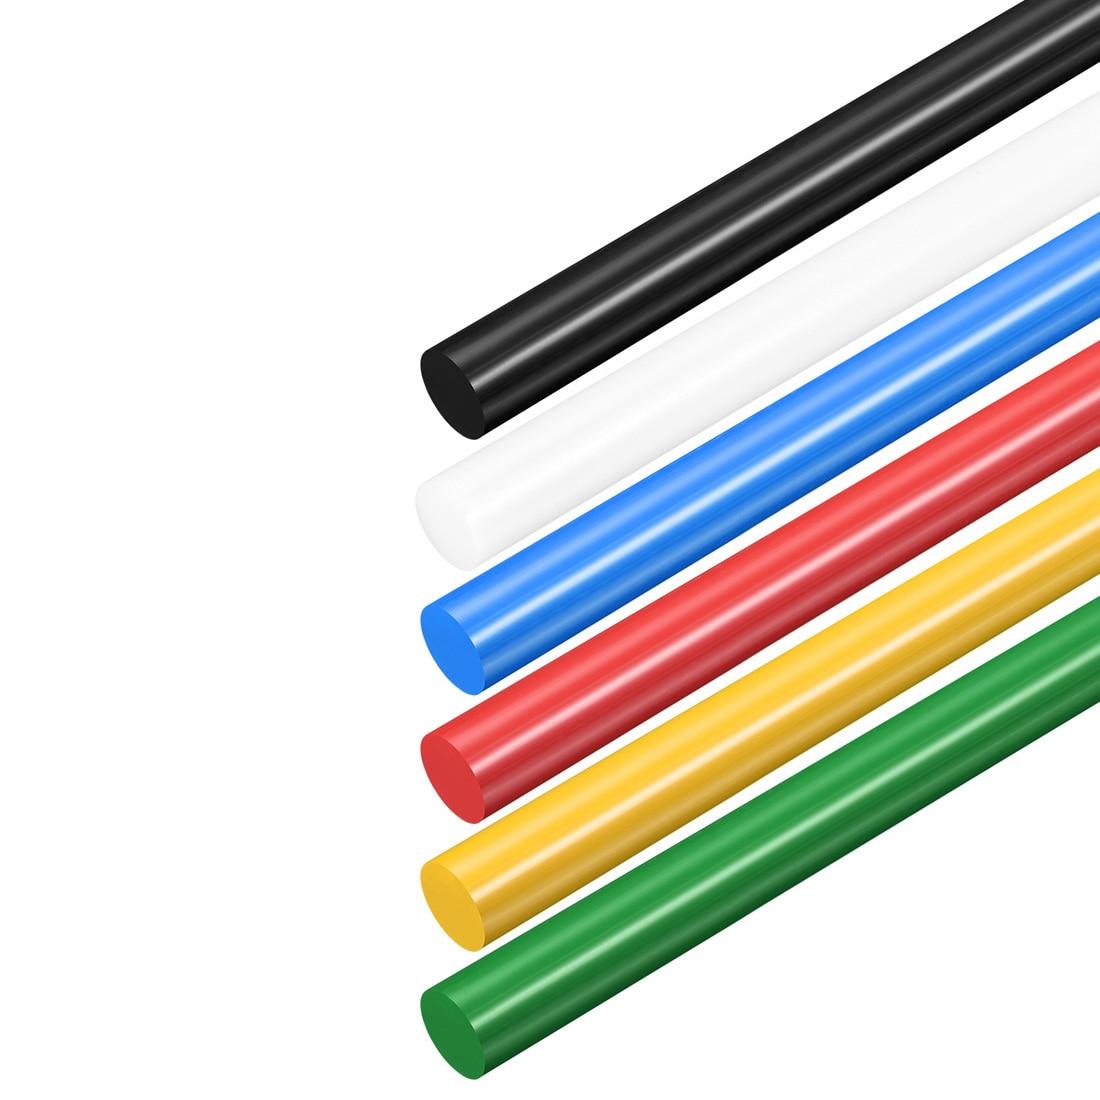 Uxcell 1Pcs 2Pcs 3Pcs Plastic Round Rod Polyoxymethylene Rods 8mm Dia 50cm Length Engineering Plastic Round Bar Tough Stable